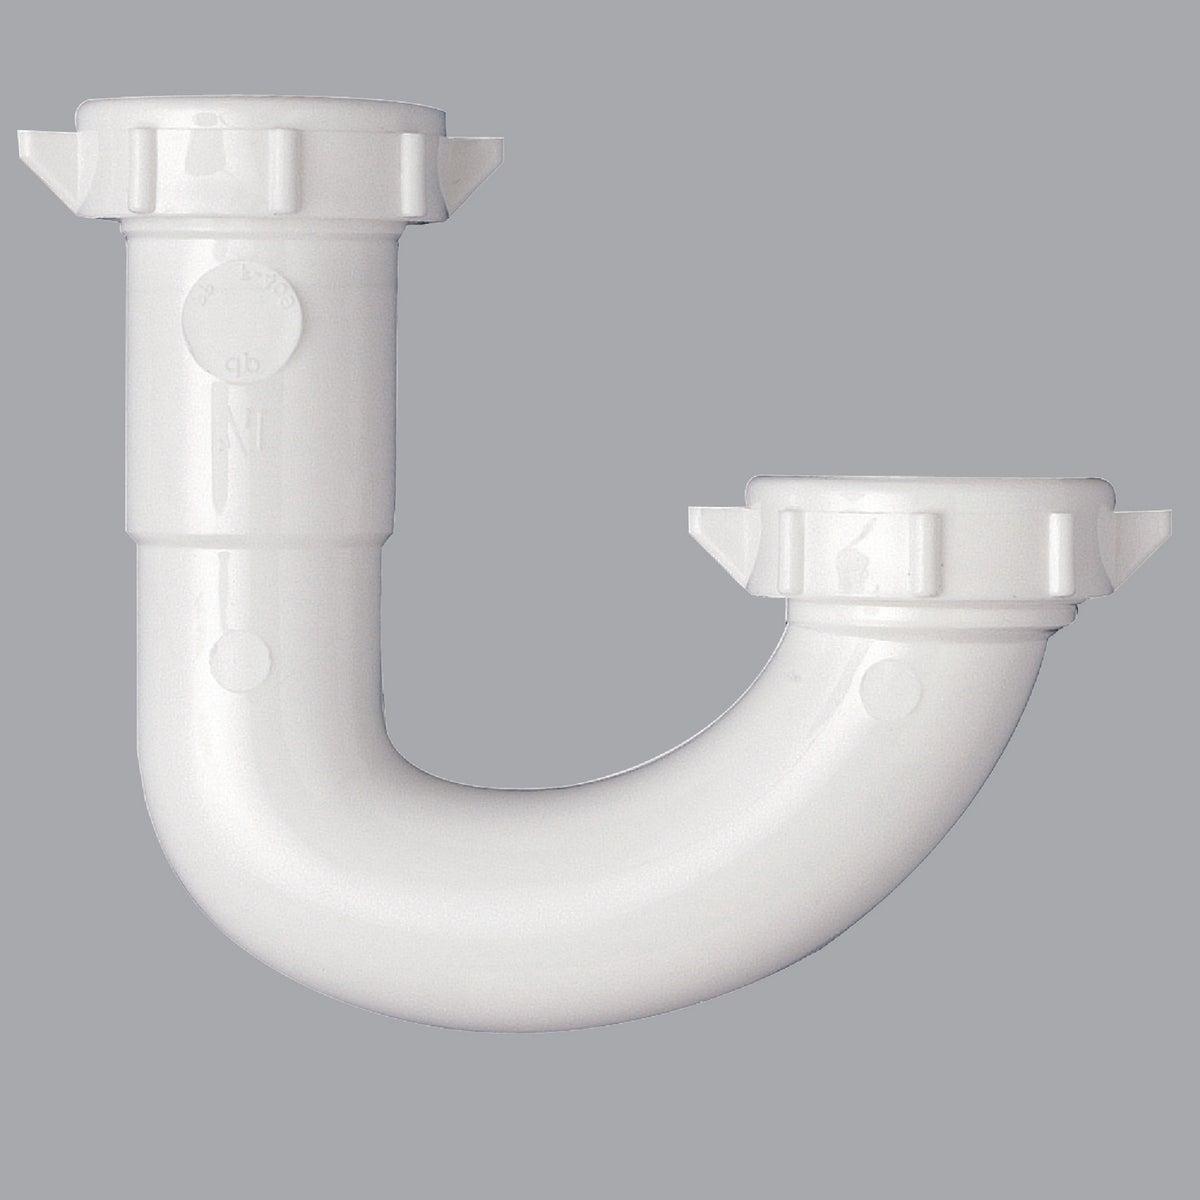 1-1/4 WHT PLASTIC J-BEND - 495093 by Plumb Pak/keeney Mfg